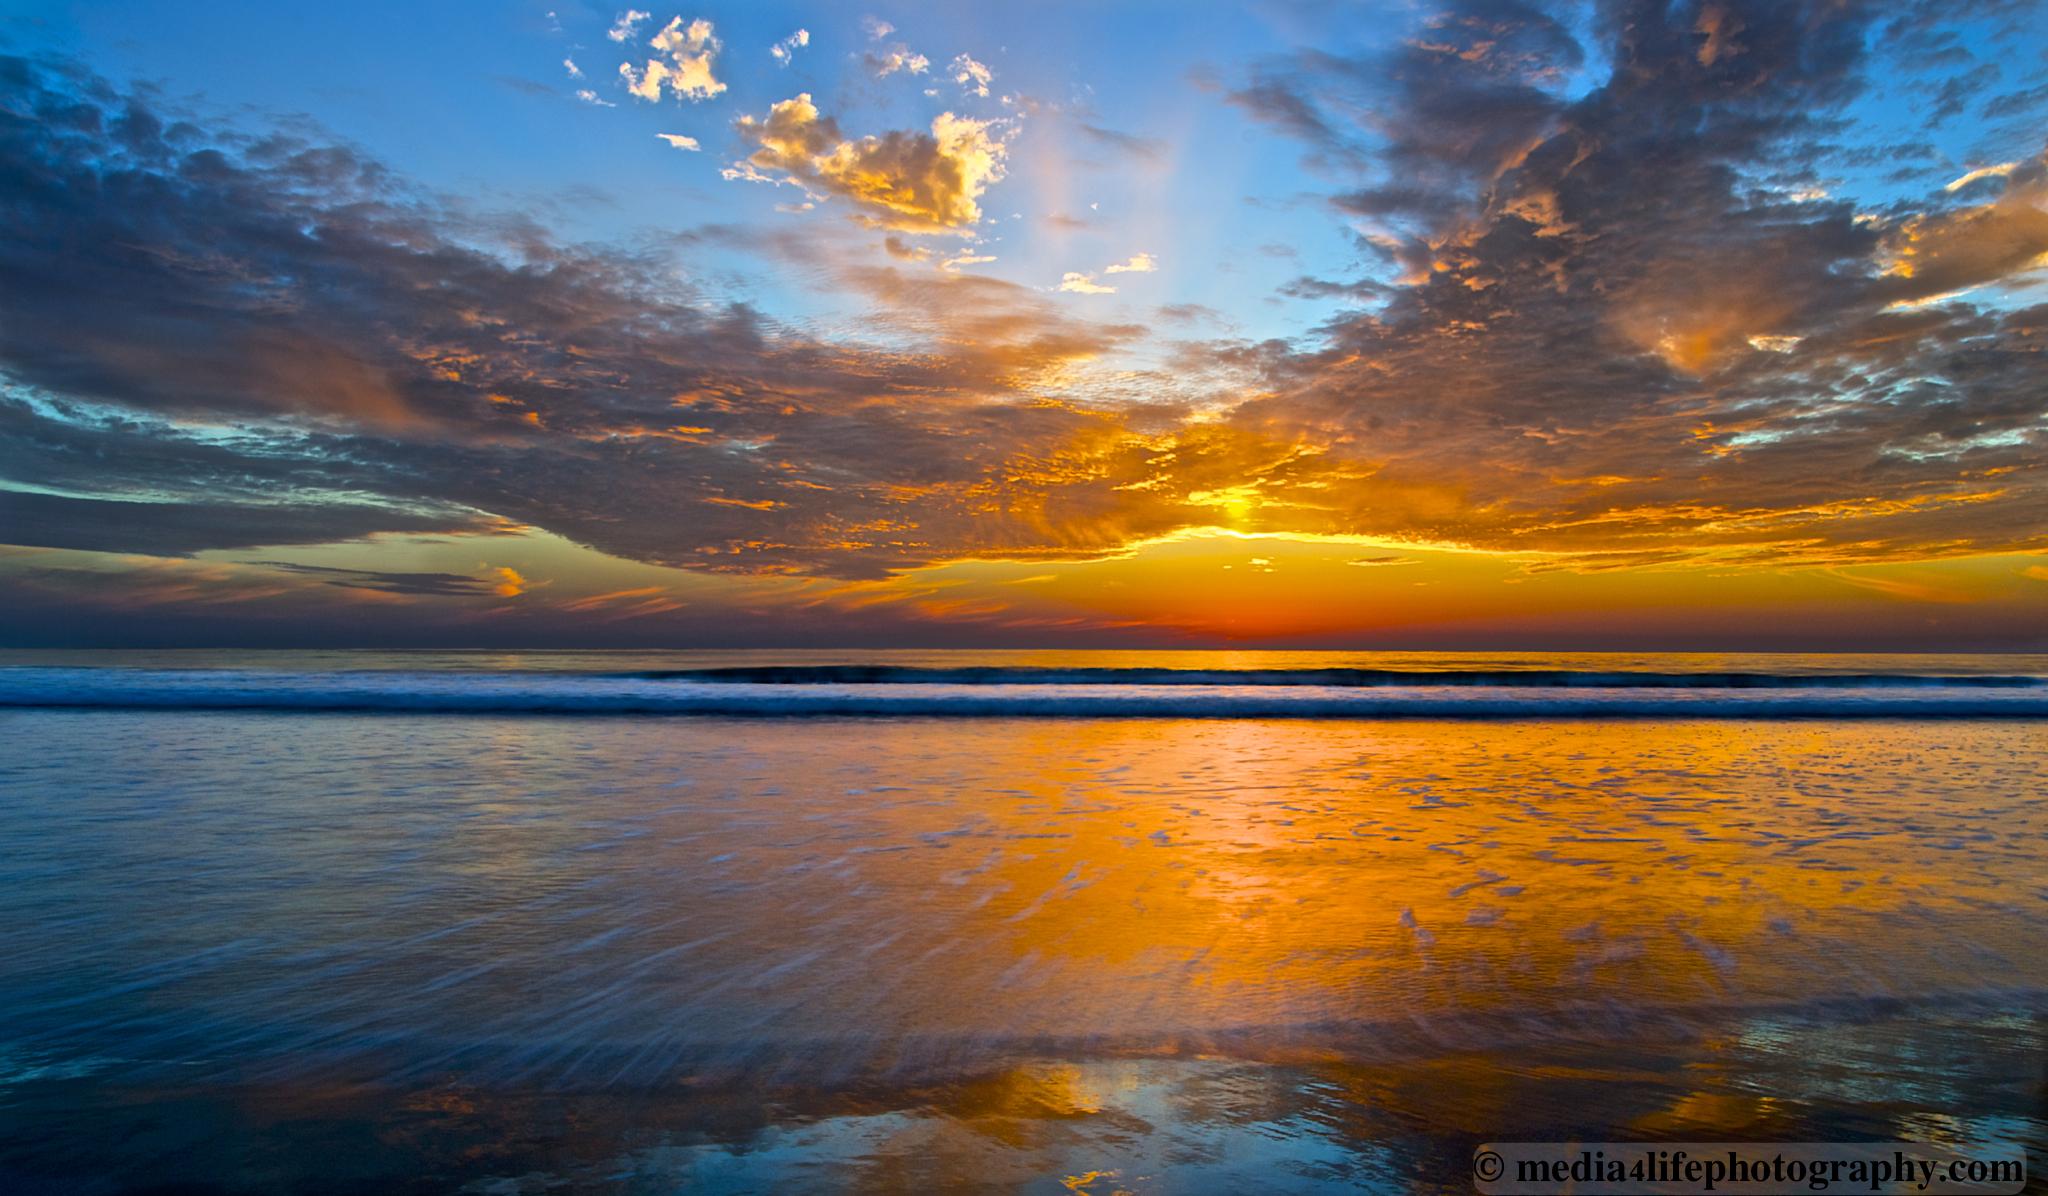 Majestic Sky | Media 4 Life Photography